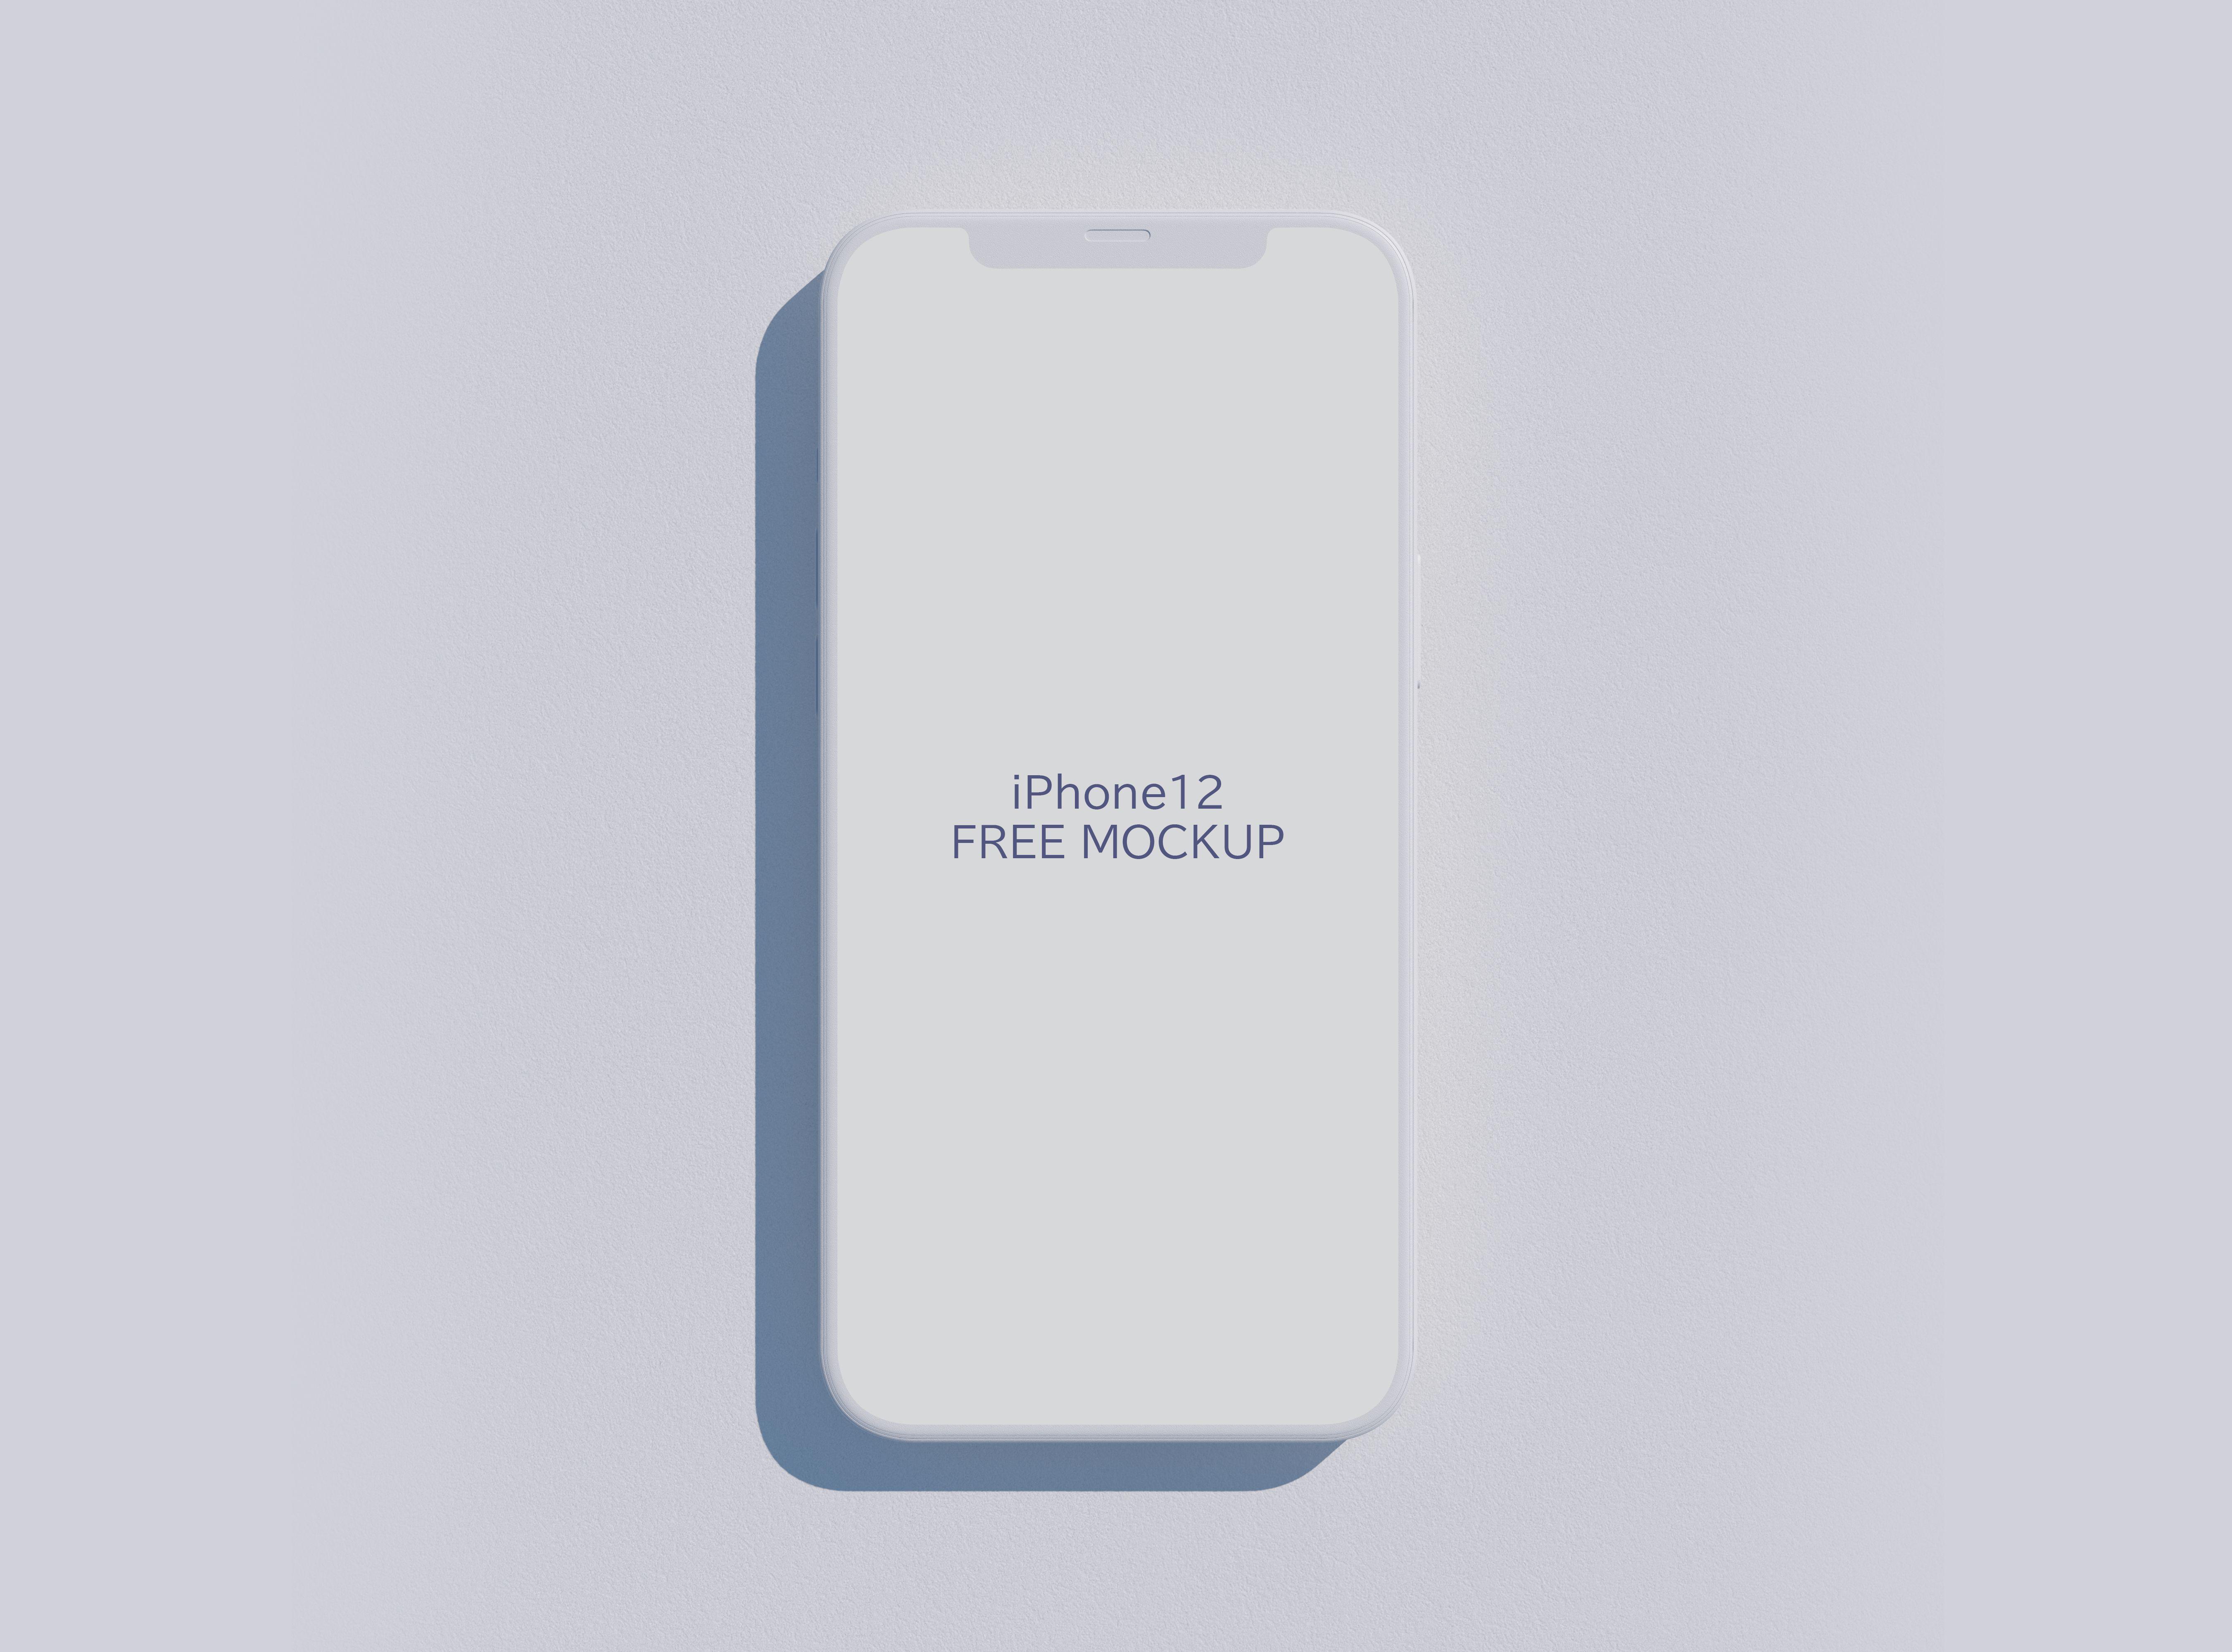 Free Iphone 12 Clay Mockup Psd In 2021 Mockup Free Download Free Mockup Free Psd Mockups Templates